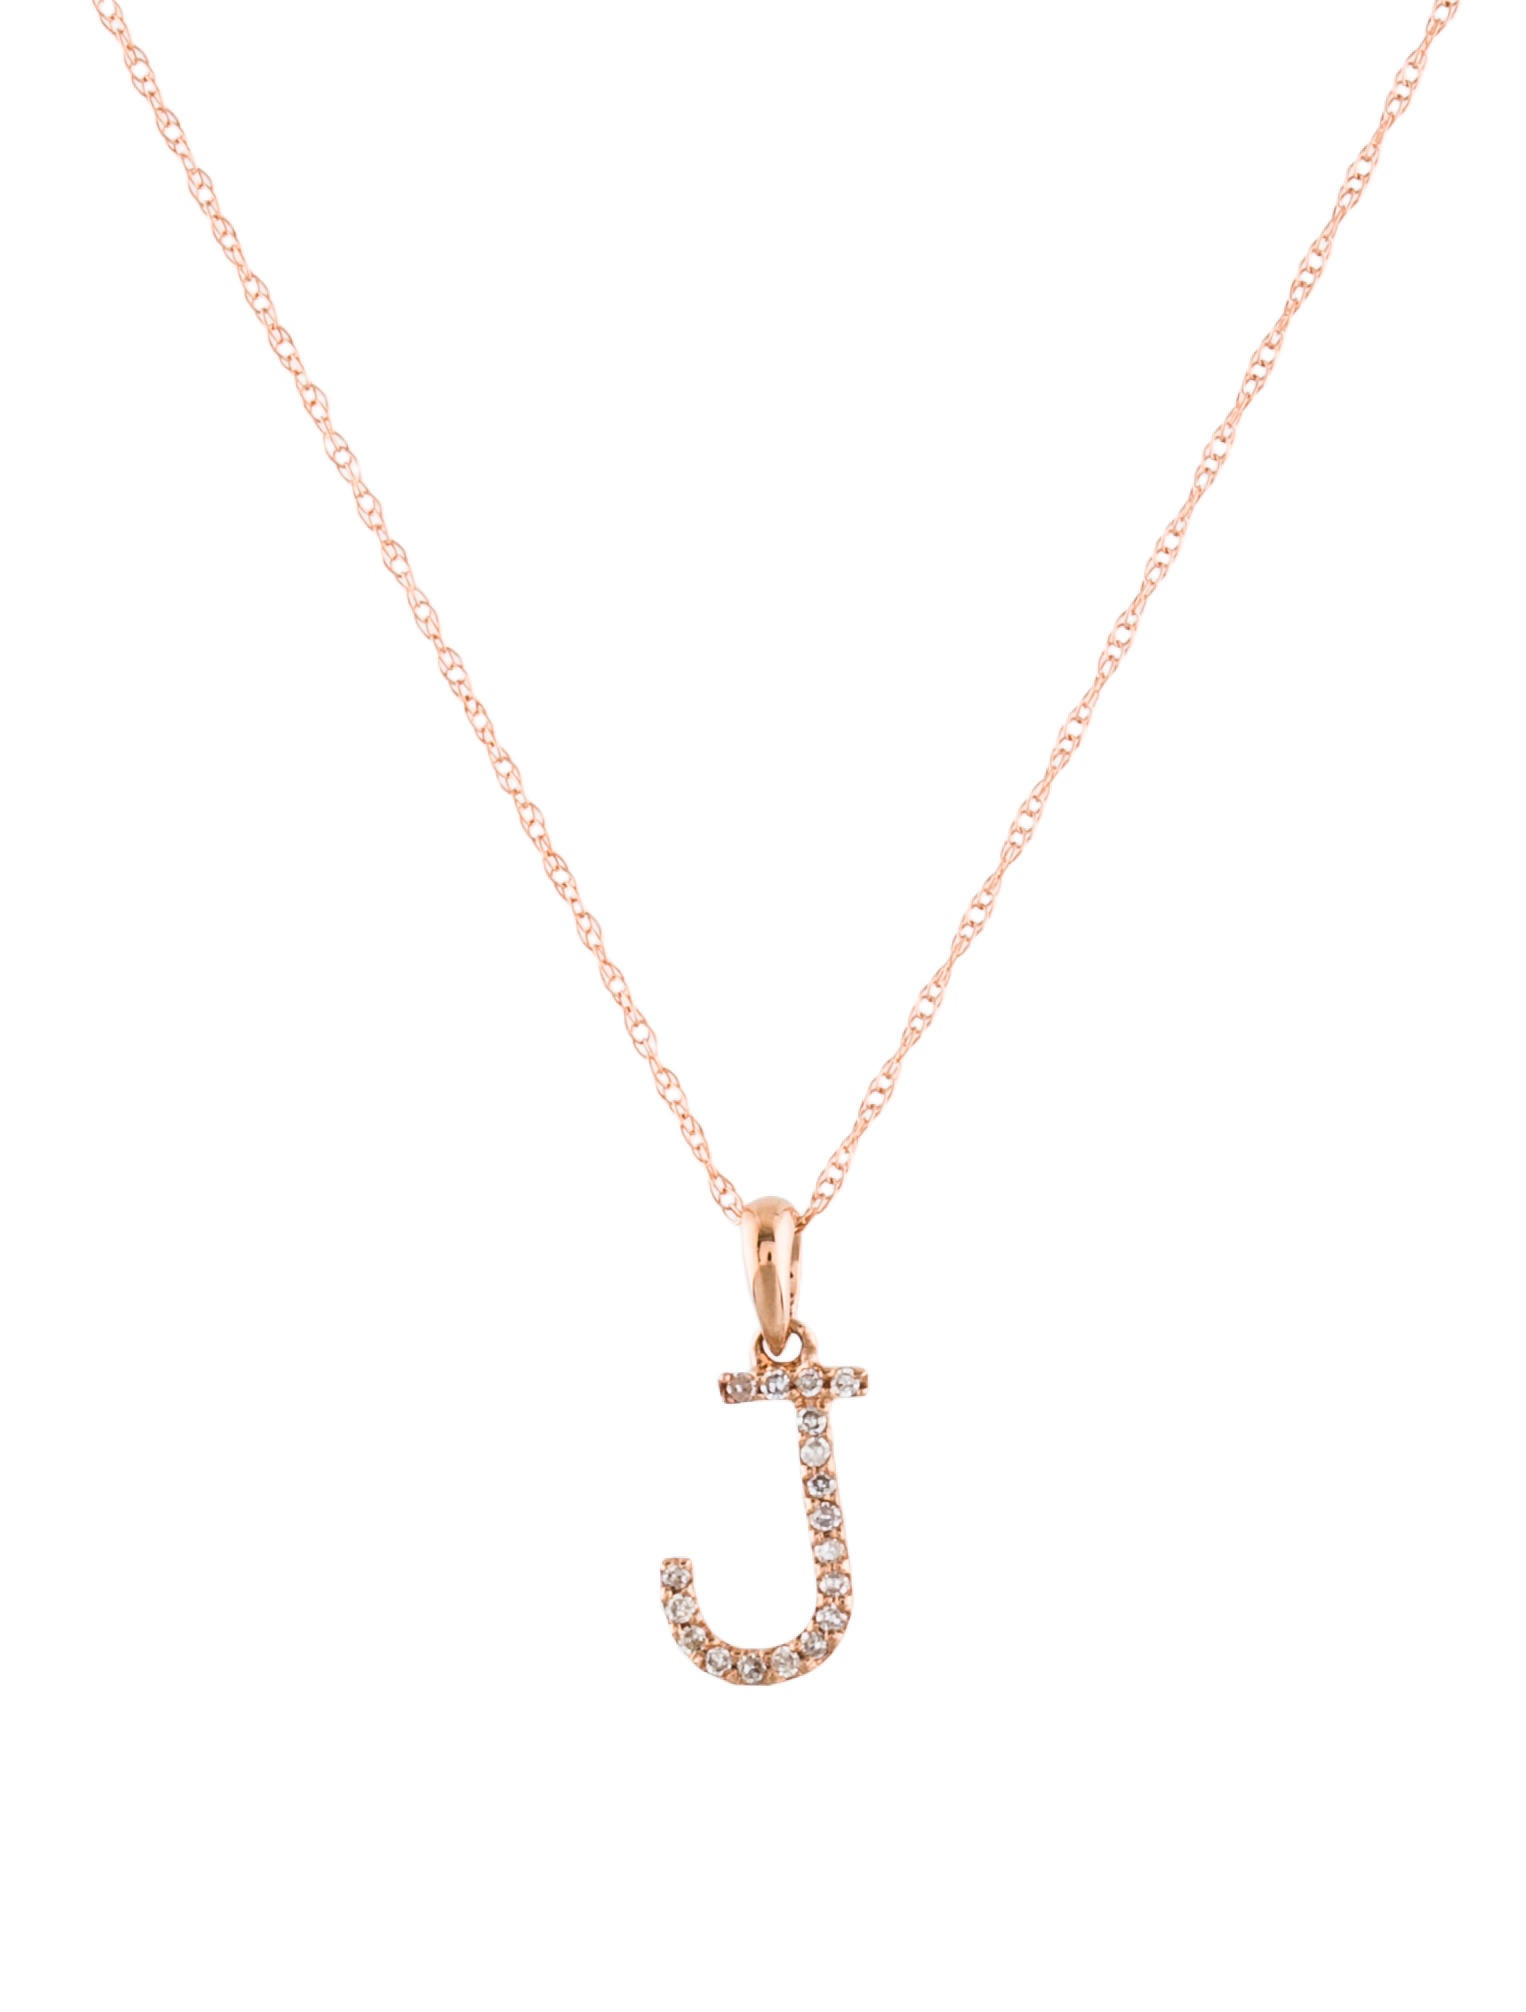 14k diamond j initial pendant necklace necklaces neckl41213 14k diamond j initial pendant aloadofball Image collections